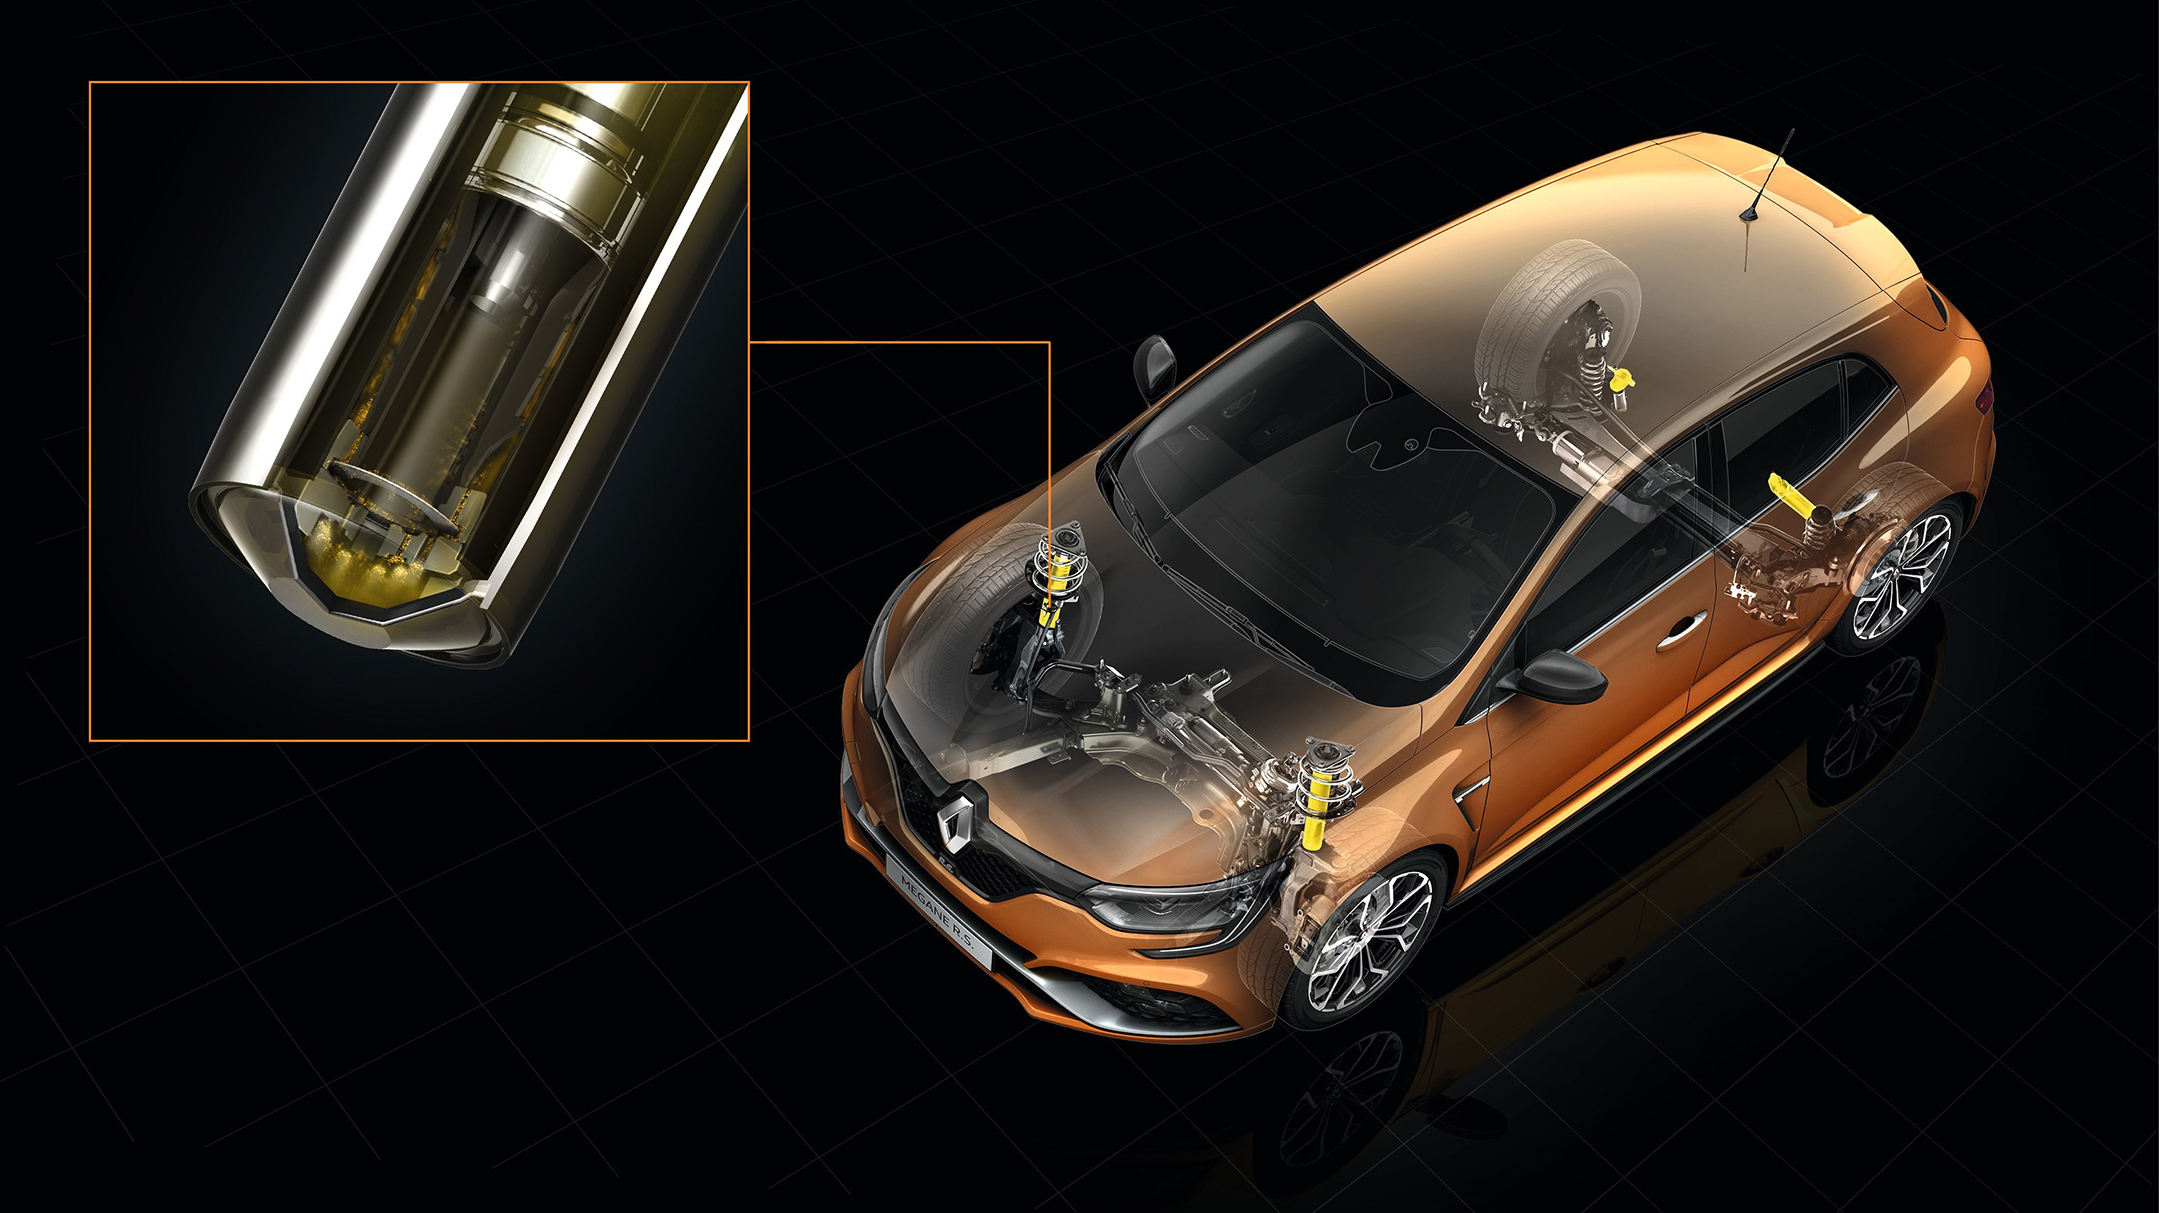 Renault Mégane R.S. - 2017 - châssis